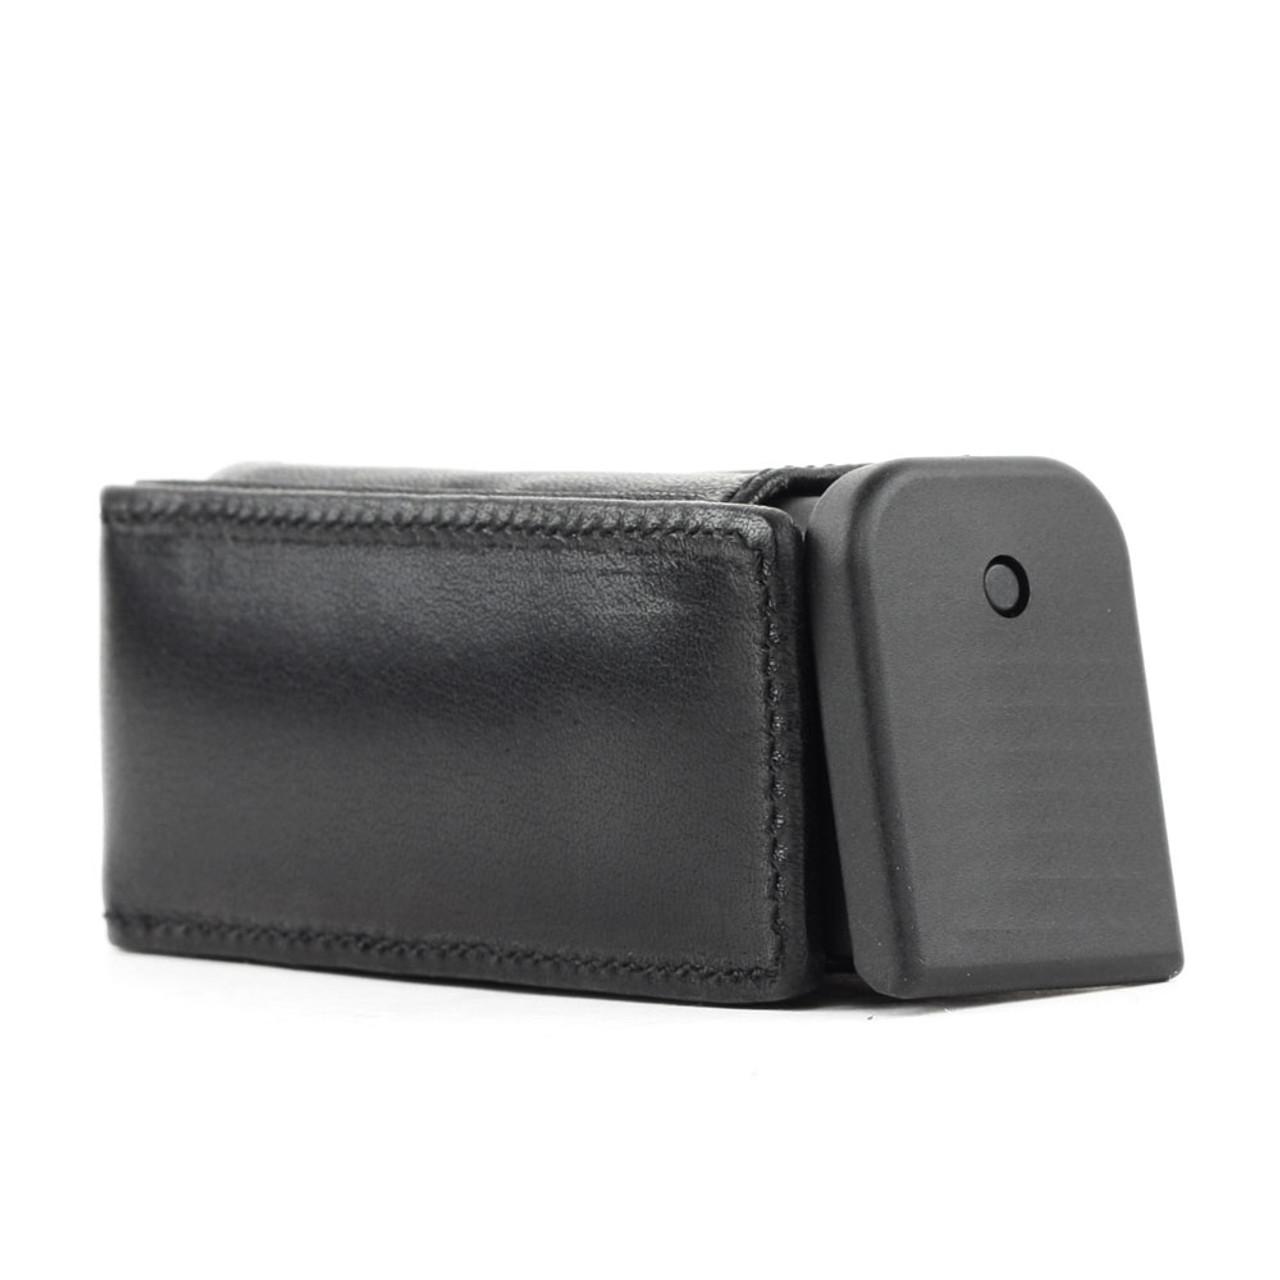 M&P 40c Magazine Pocket Protector